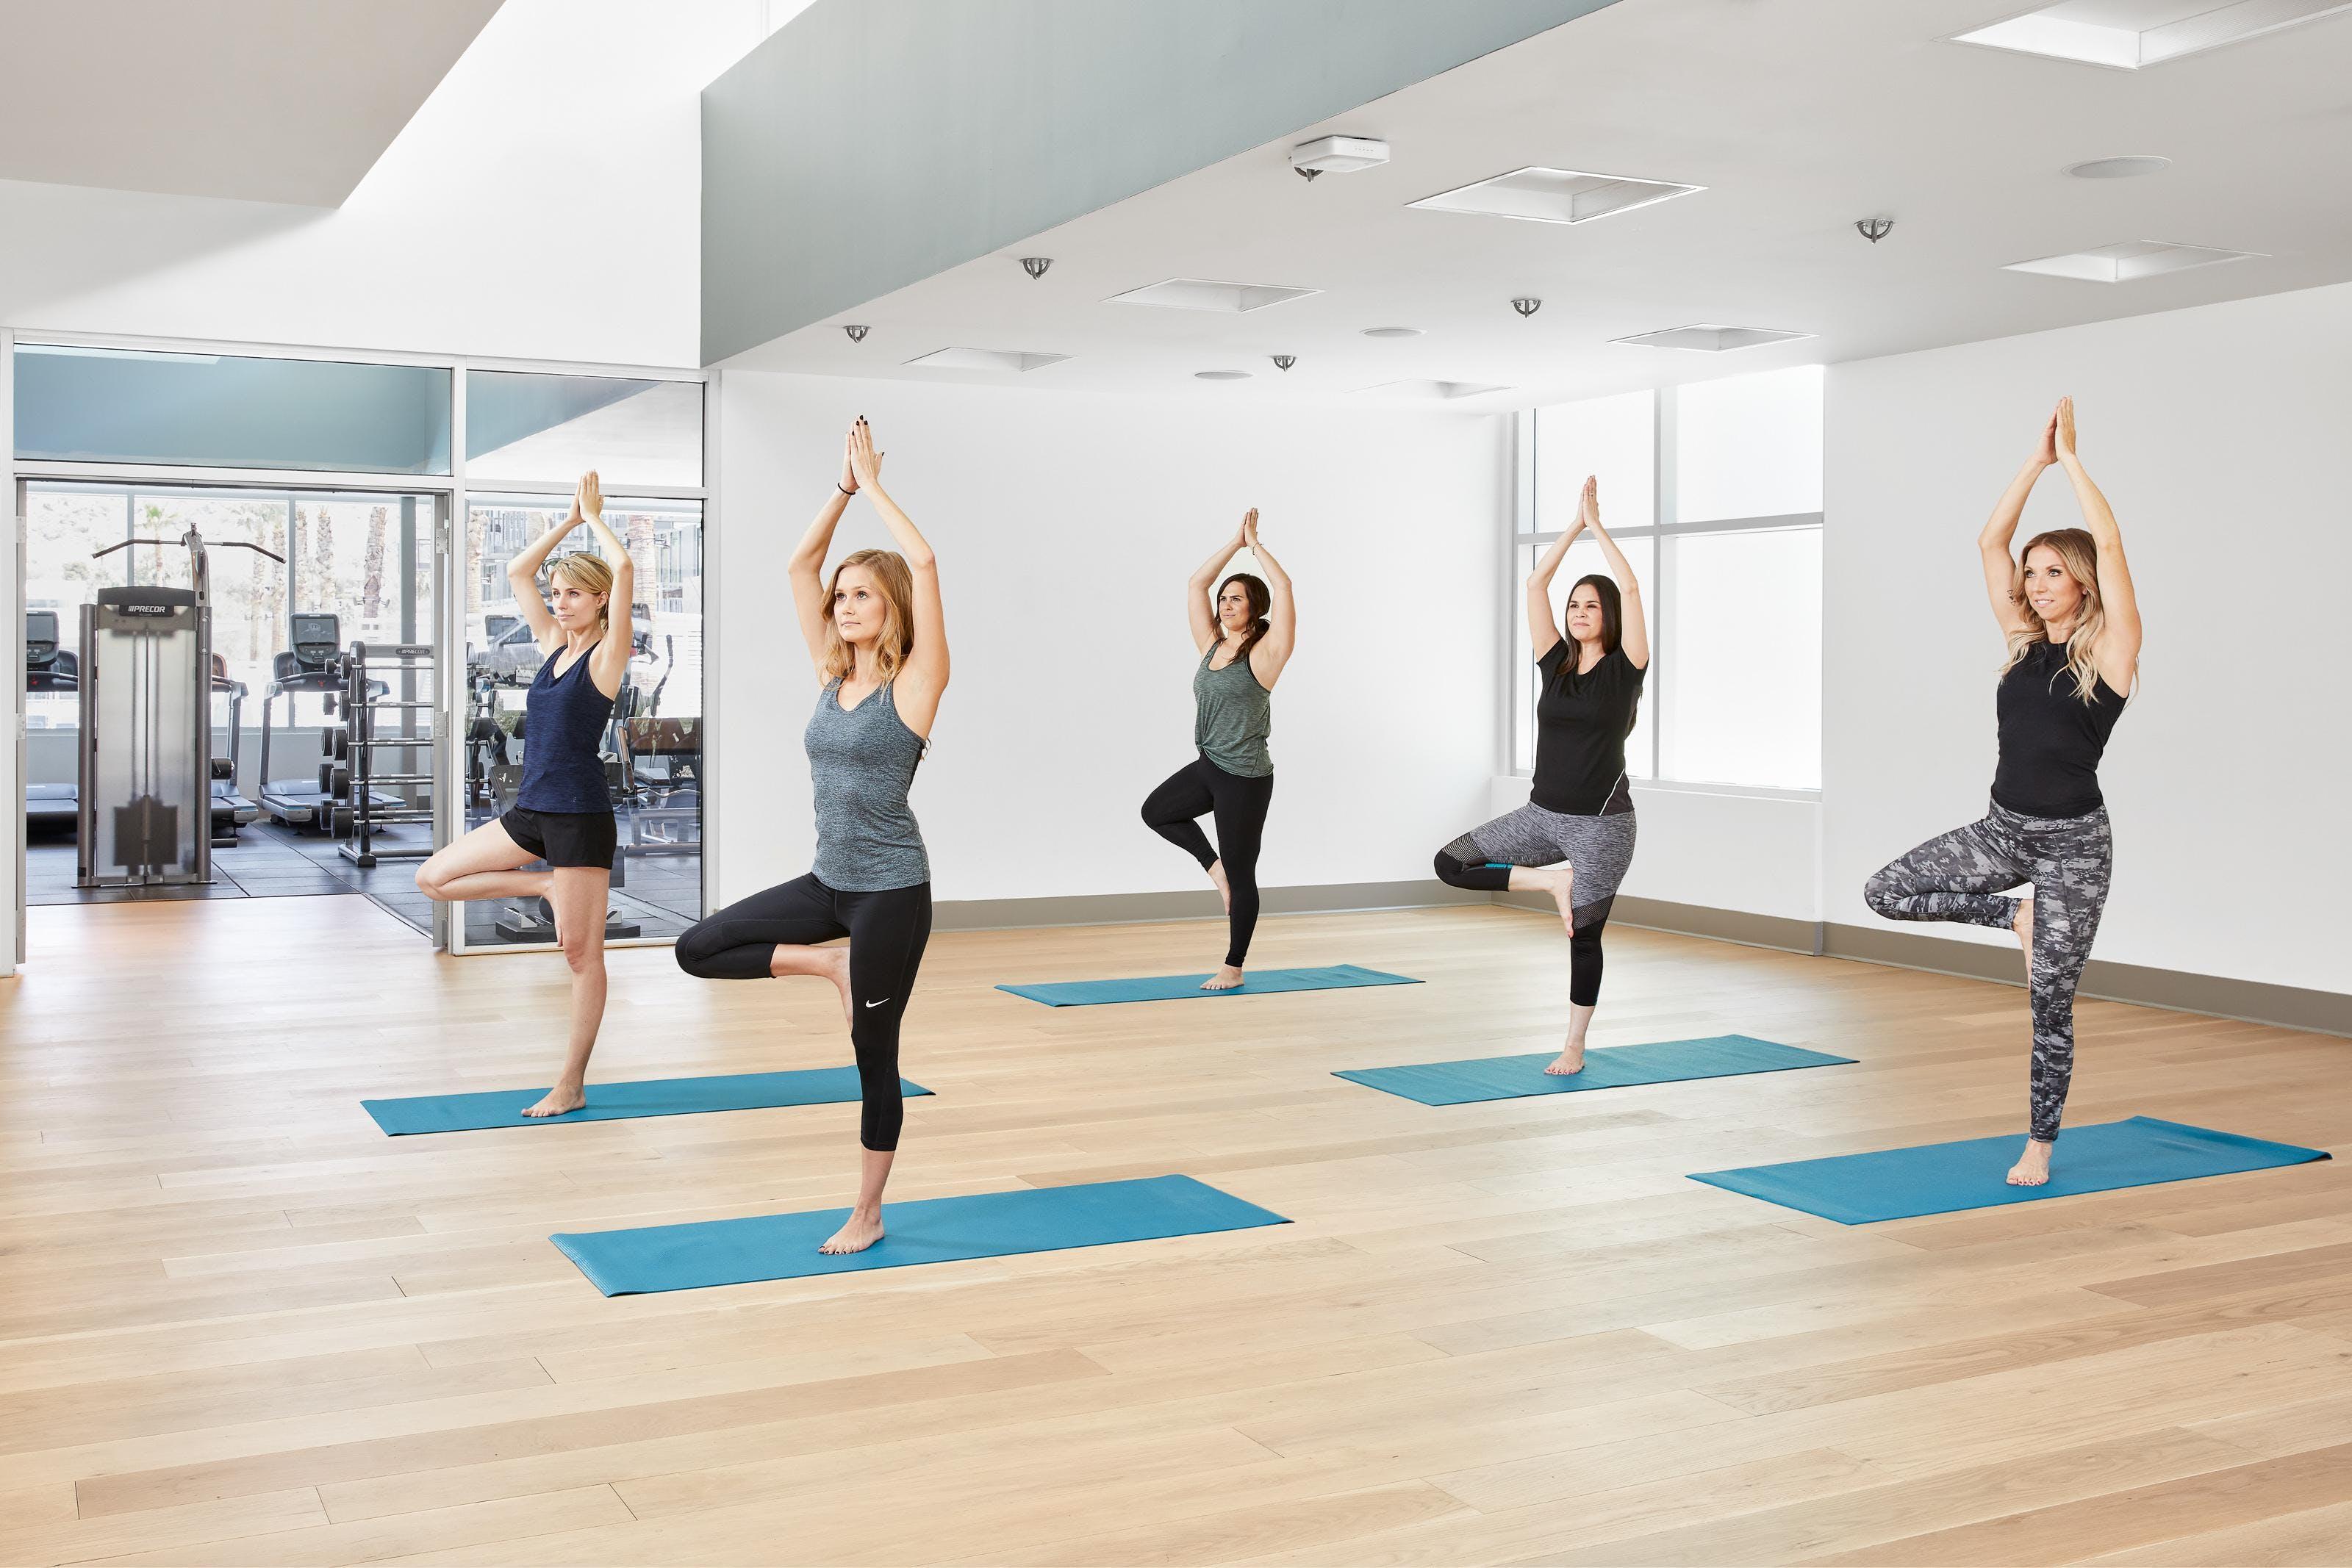 Free flow Yoga - Studio Class